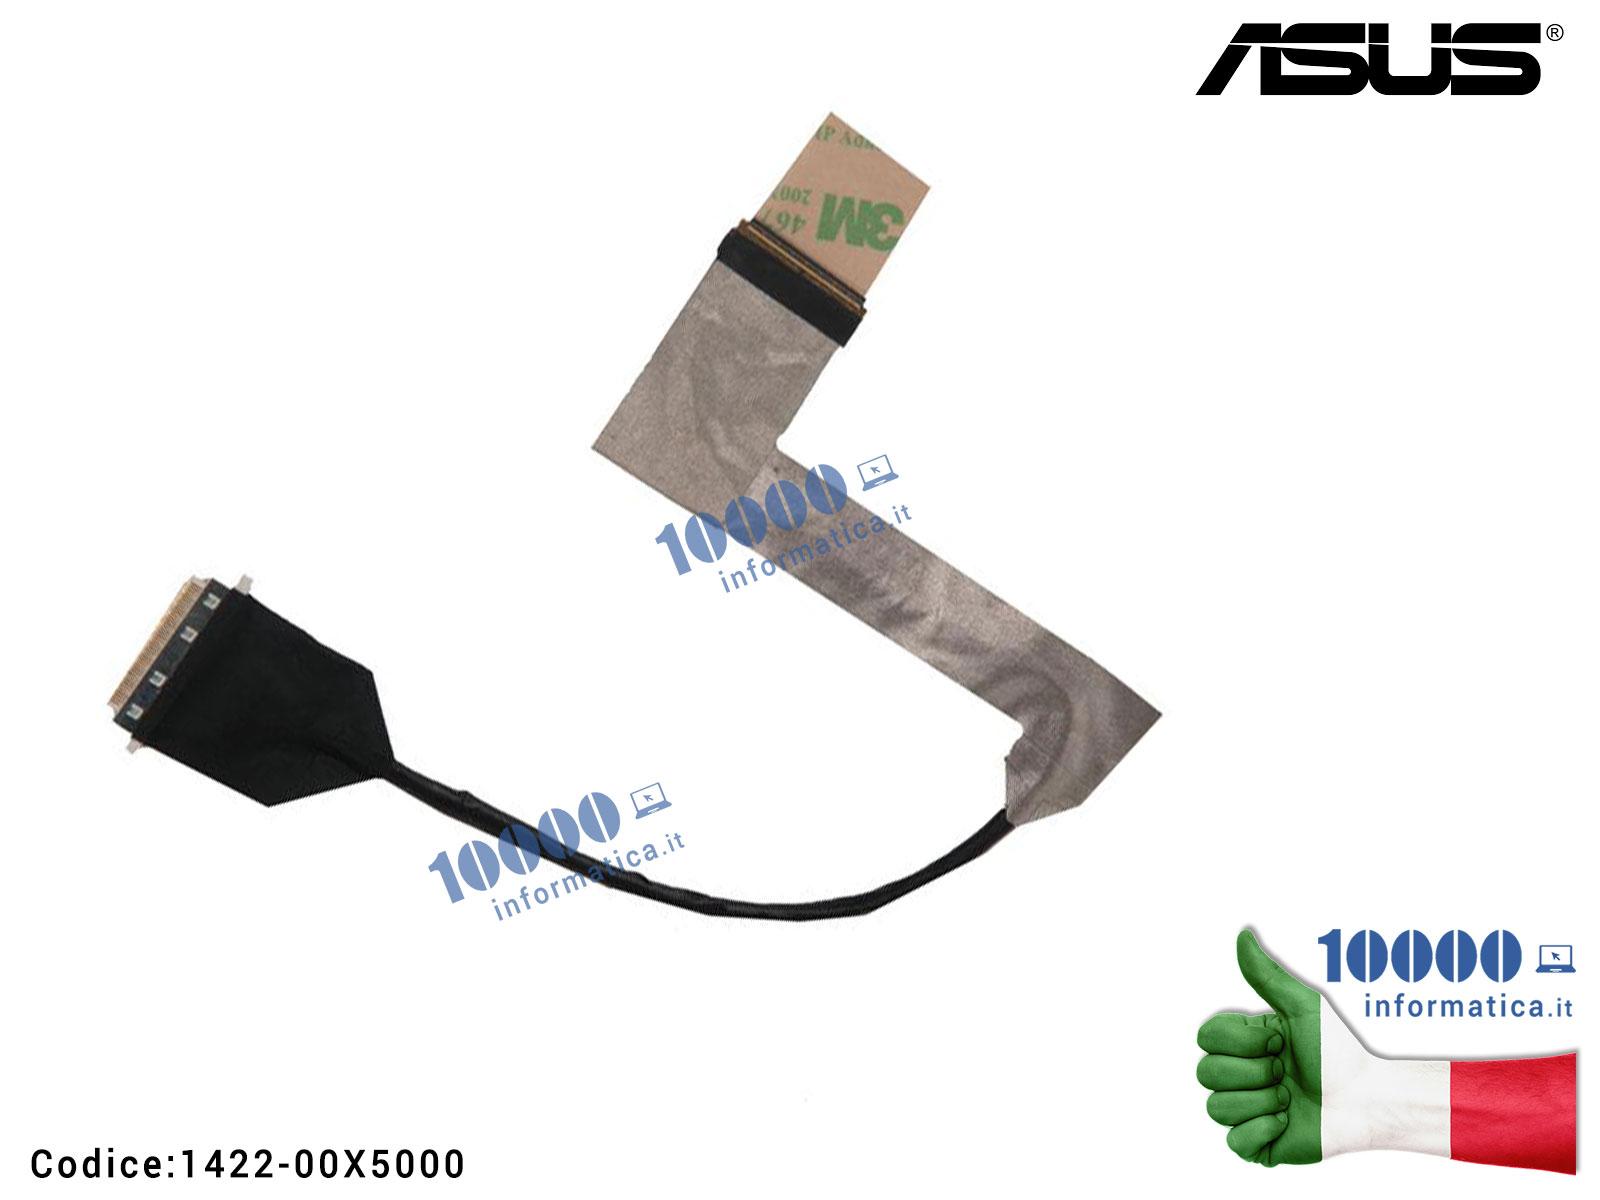 Asus x73e